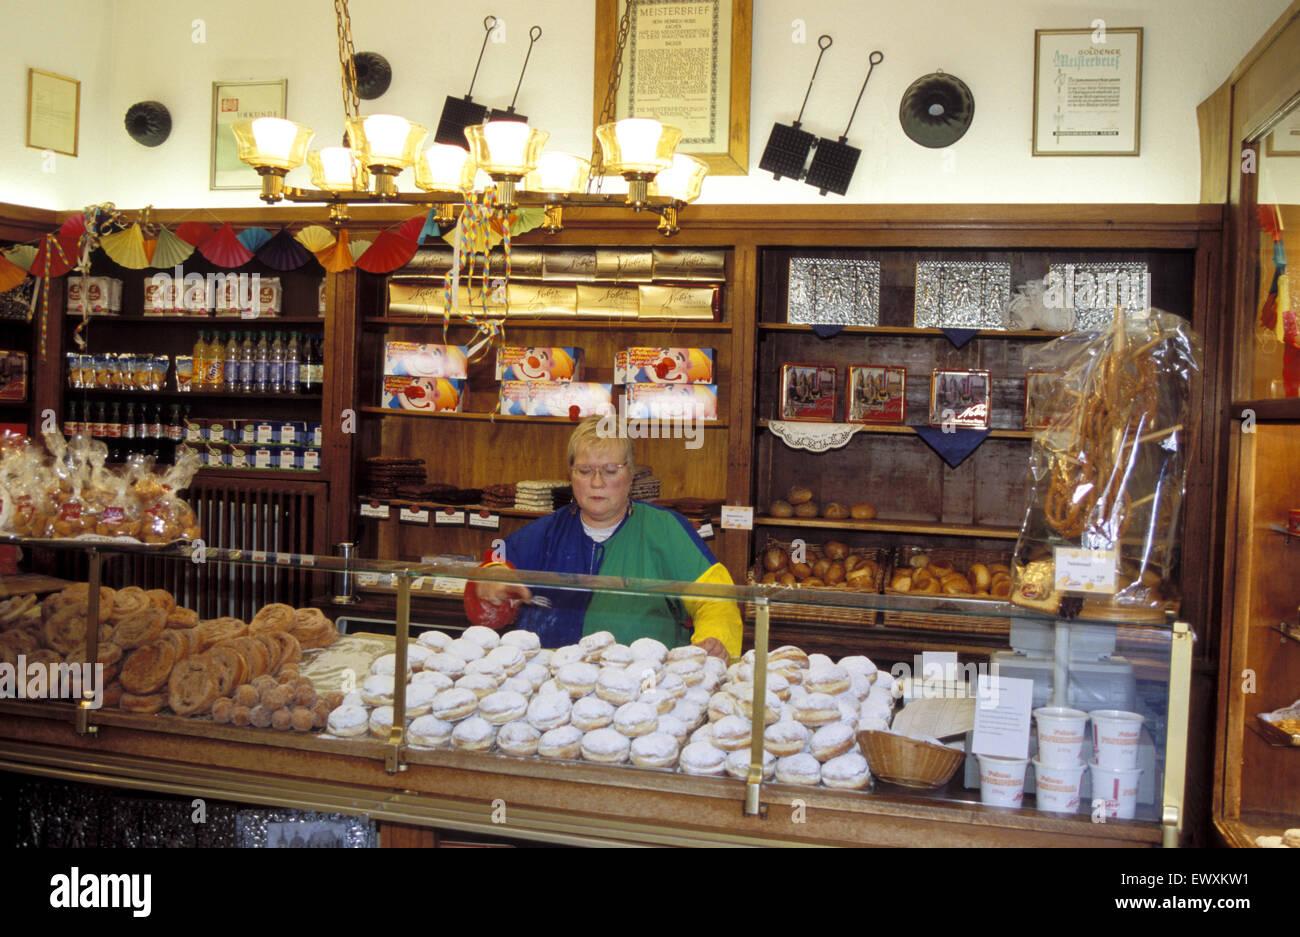 DEU, Germany, Aachen, baker´s shop at the Oppenhof Avenue.  DEU, Deutschland, Aachen, Baeckerei an der Oppenhof - Stock Image